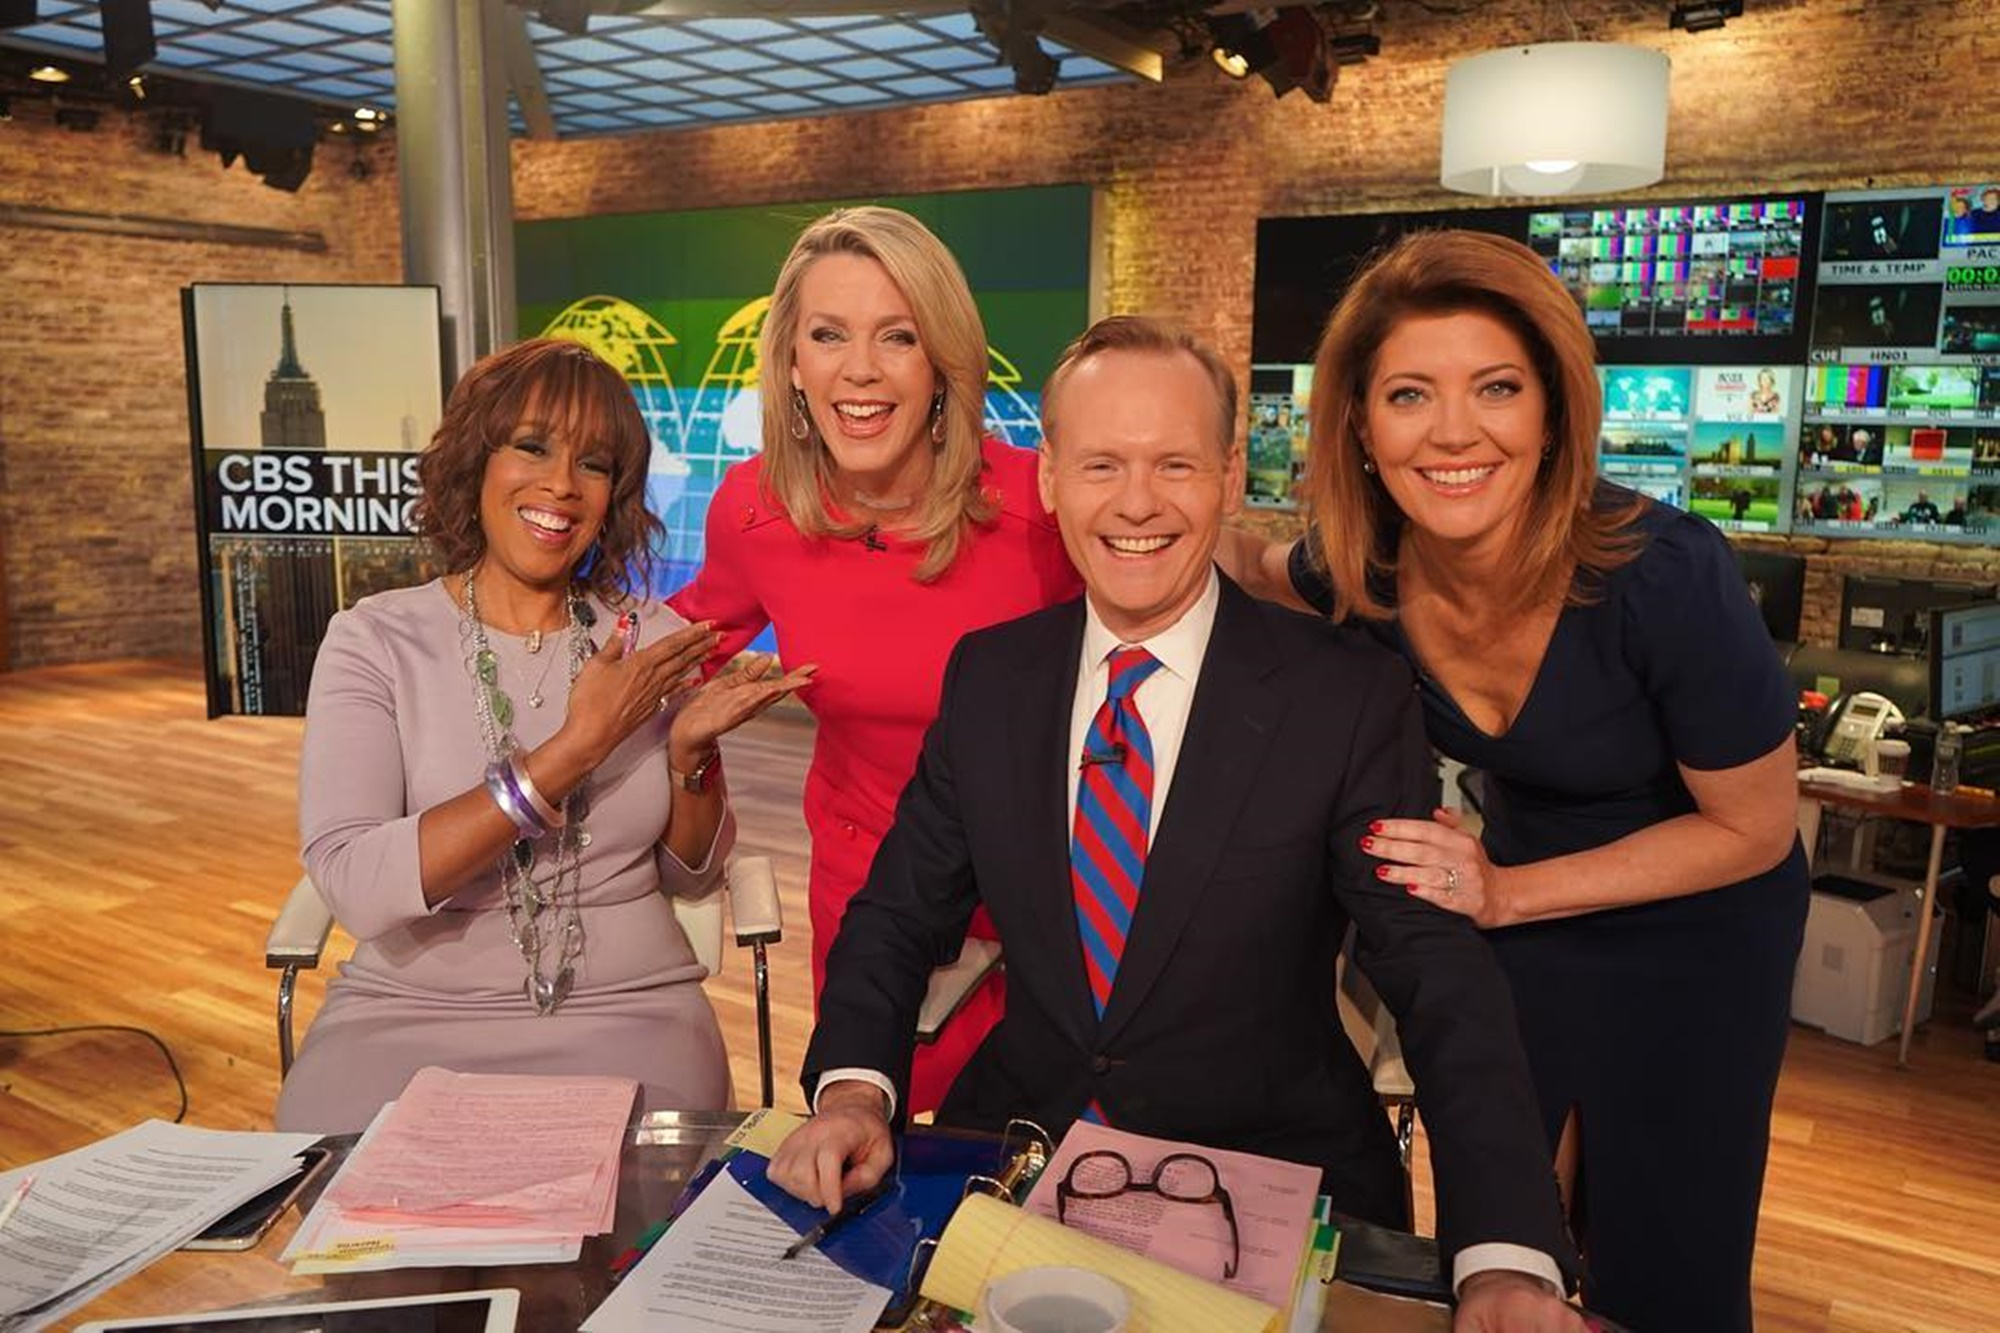 CBS This Morning Gayle King Deborah Norville John Dickerson Norah O'Donnell